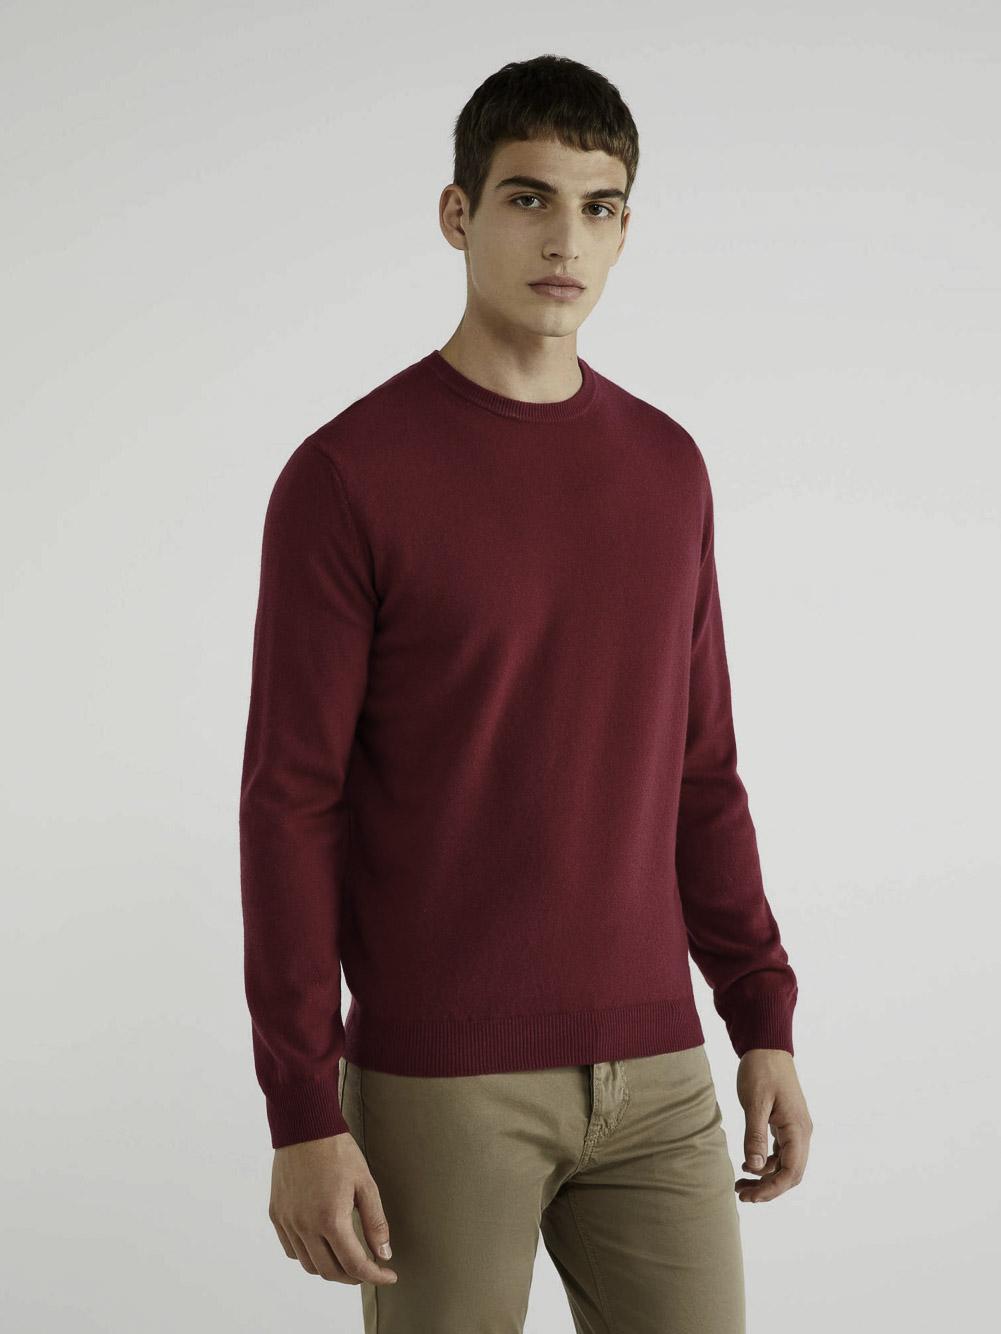 BENETTON Μπλούζα με λαιμόκοψη 100% παρθένο μαλλί 1002U1G34 20A08M